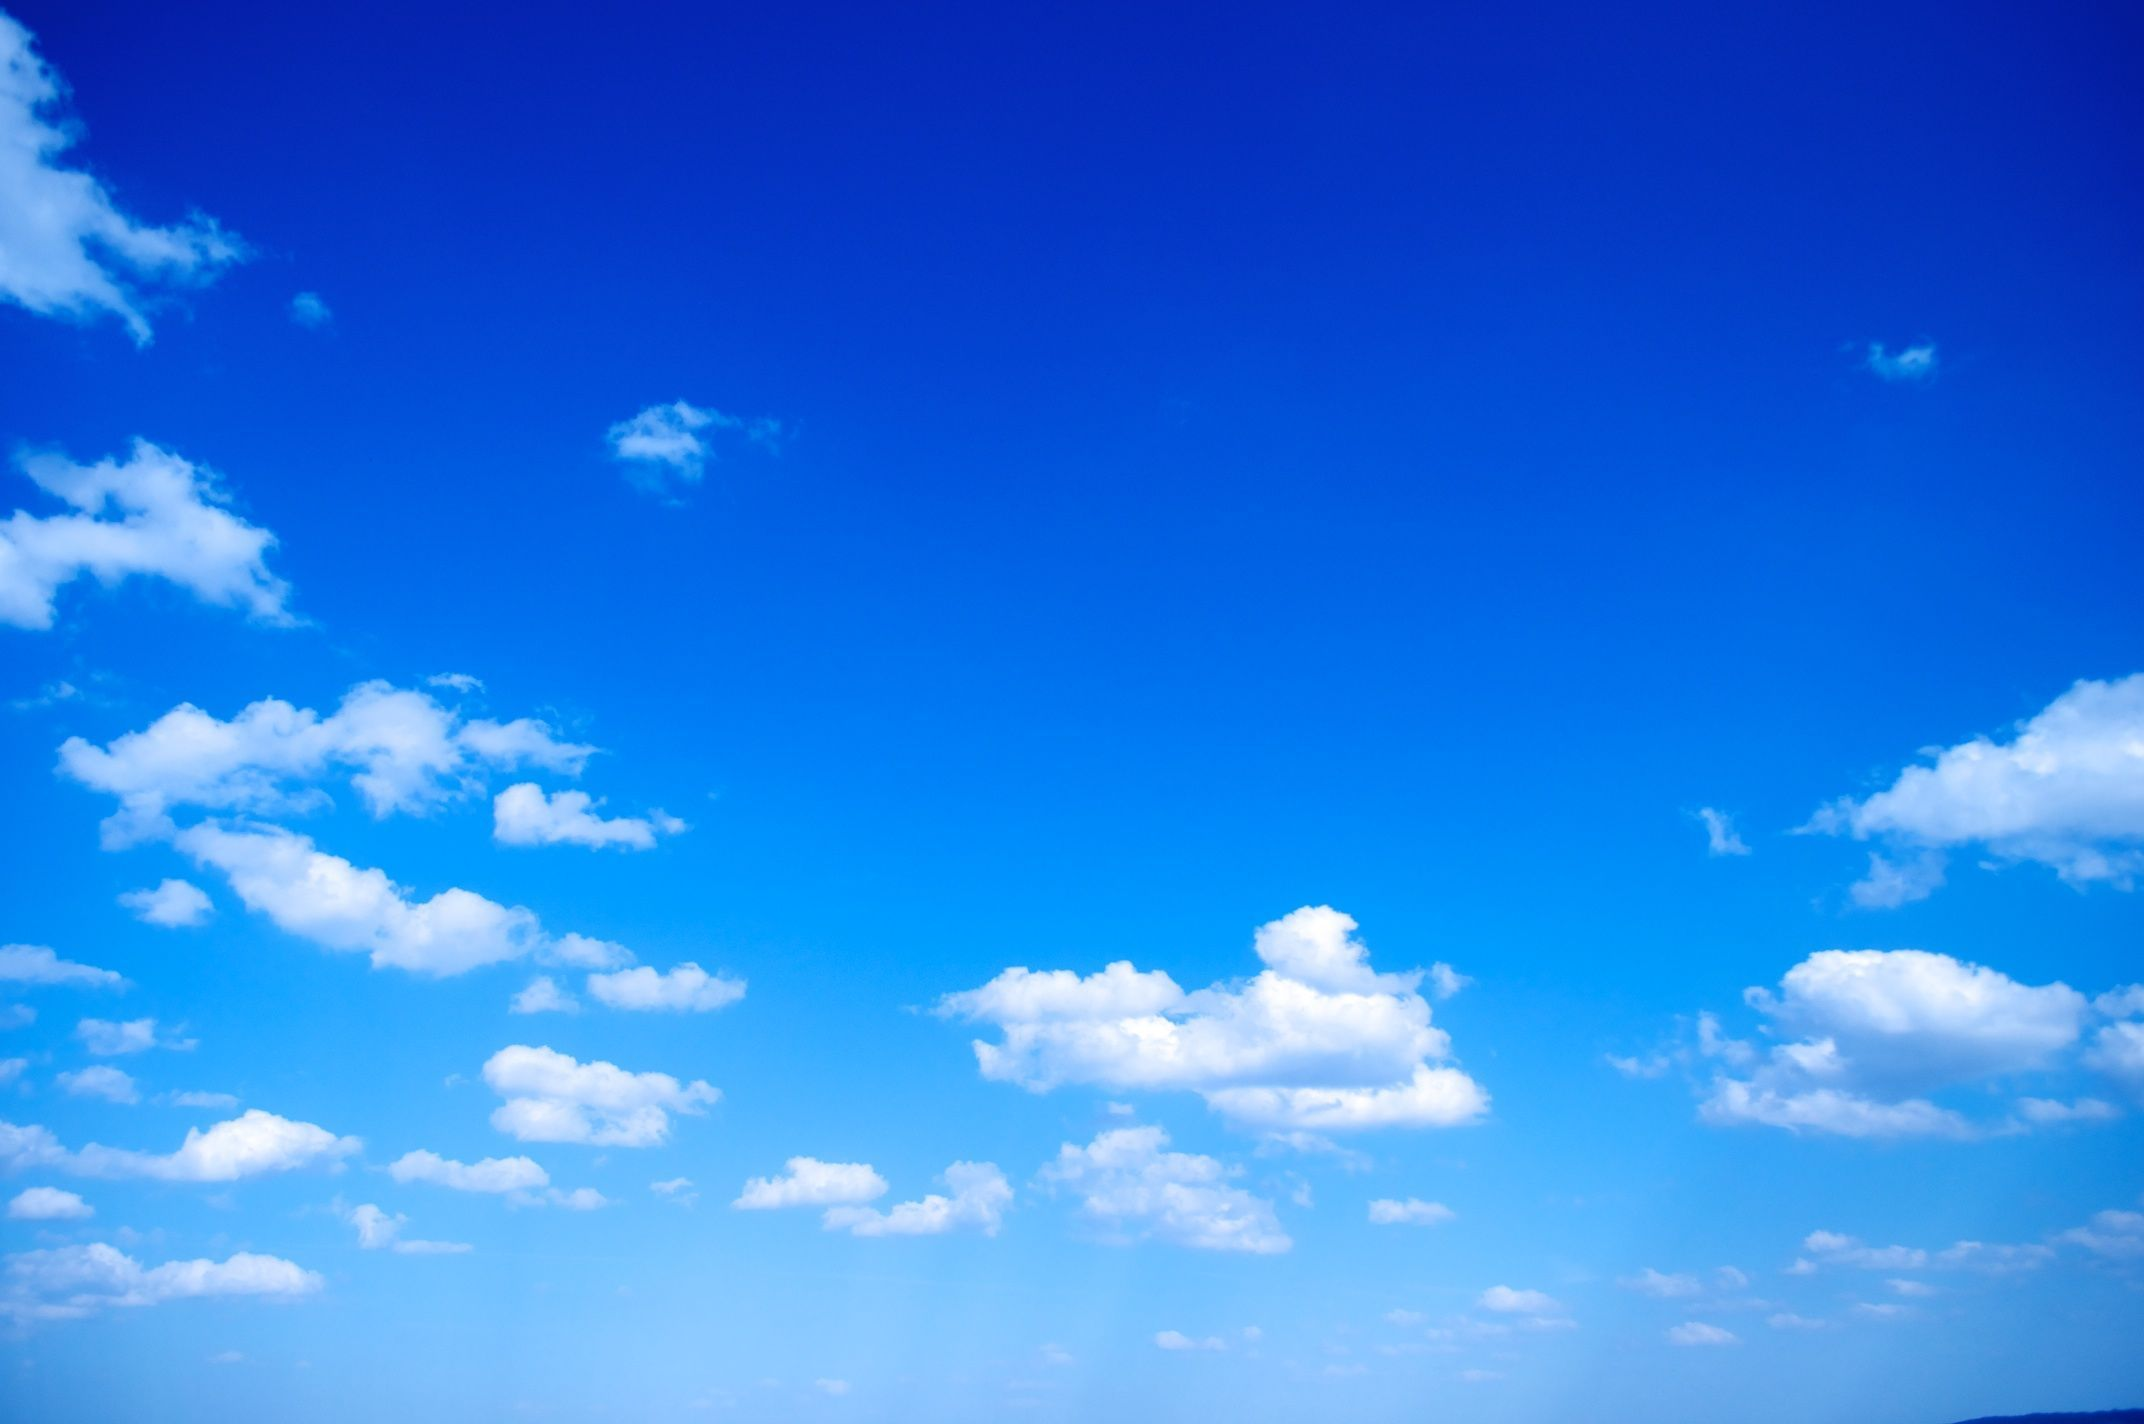 essay question why is the sky blue webassign Vertigo winters edge 1997- 3 kids vs light why is the sky blue mahabharata comic book 1 - vyasa composes supermanbatman batman v superman dawn of justice.